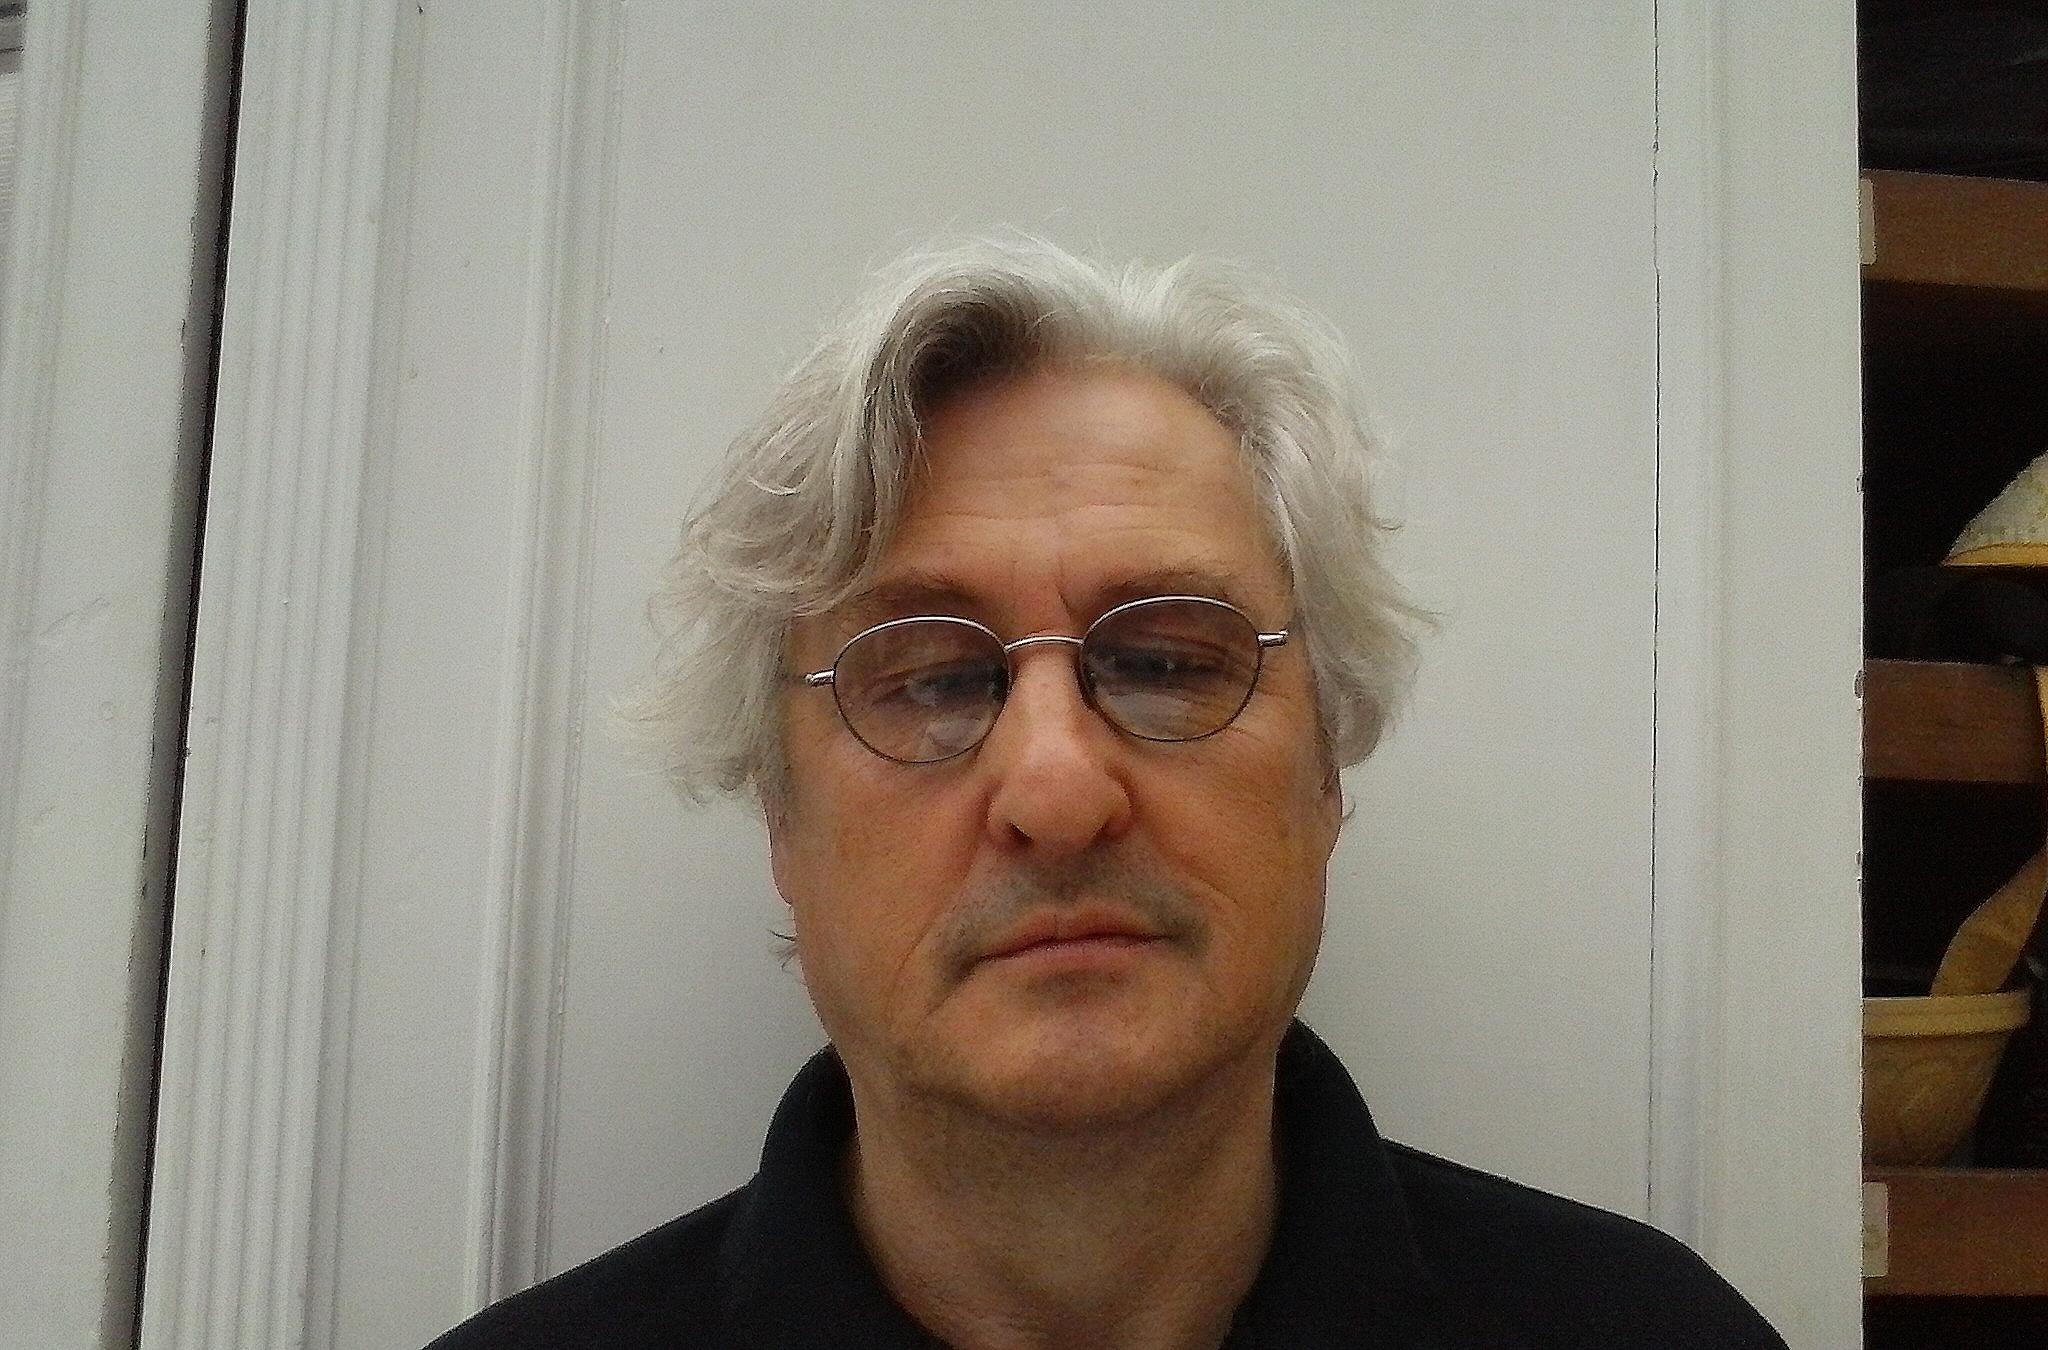 Mr. Richard Tutor